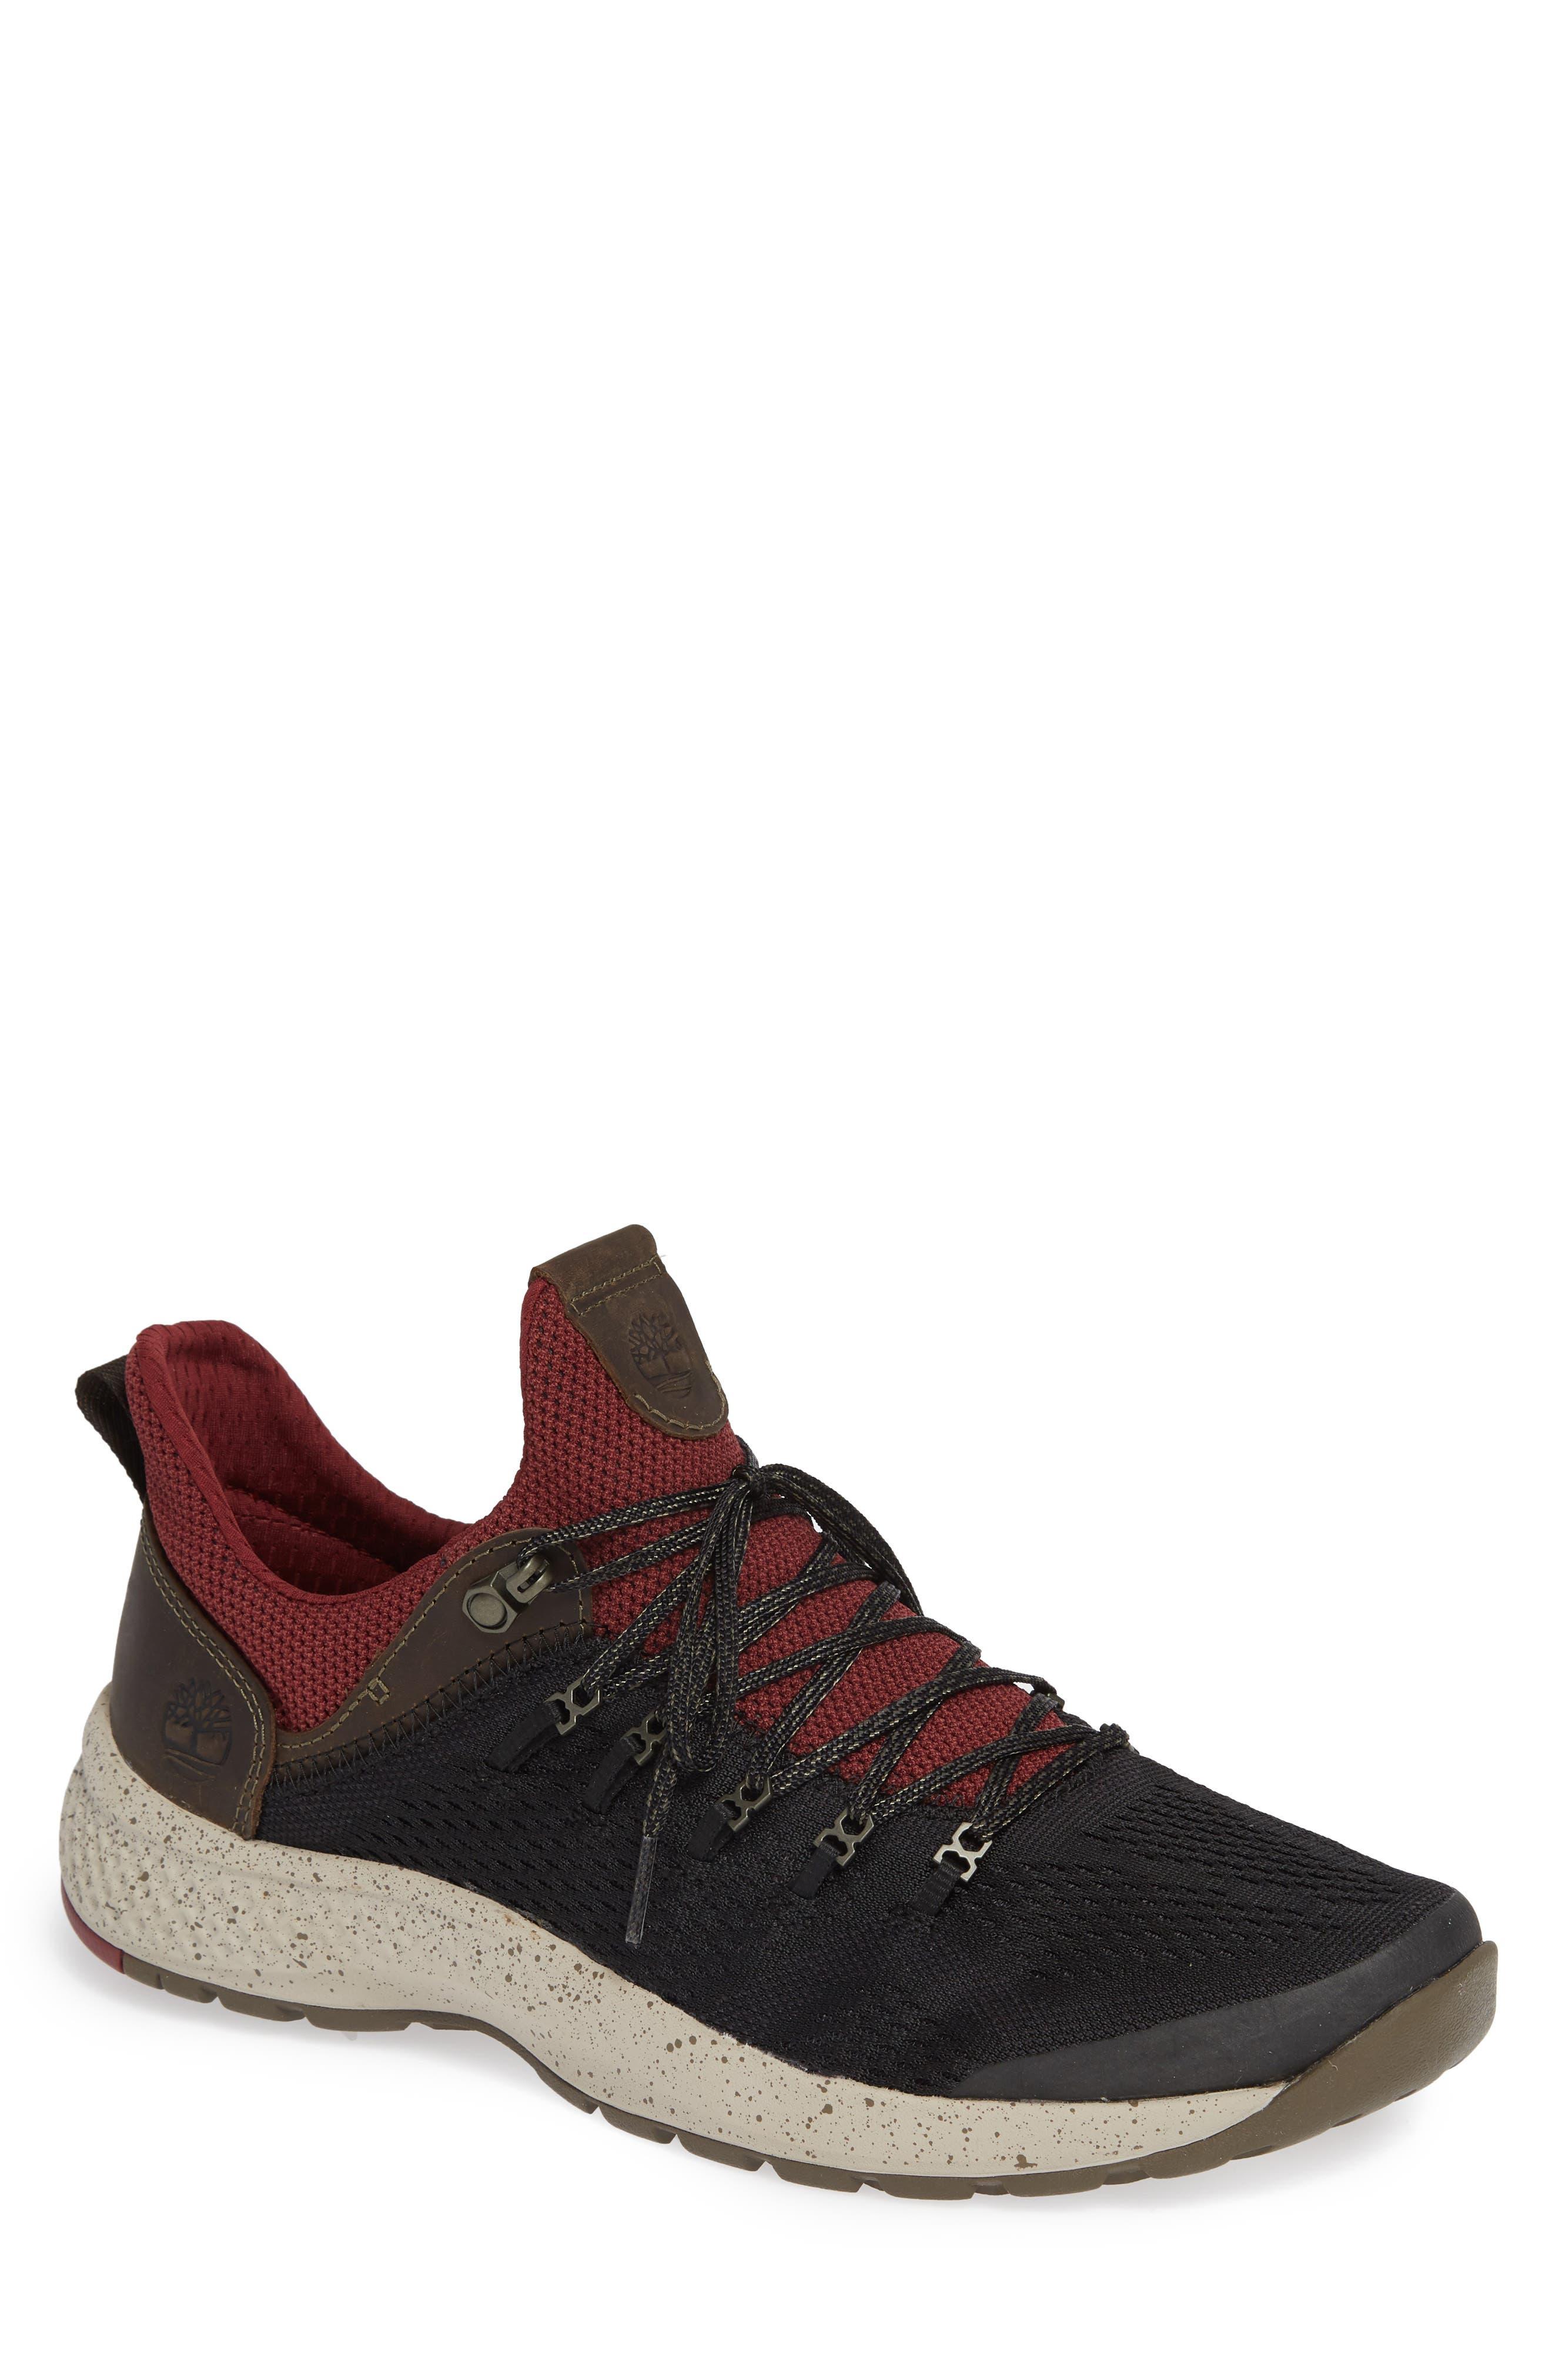 FlyRoam Trail Sneaker,                             Main thumbnail 1, color,                             BLACK/ BURGUNDY